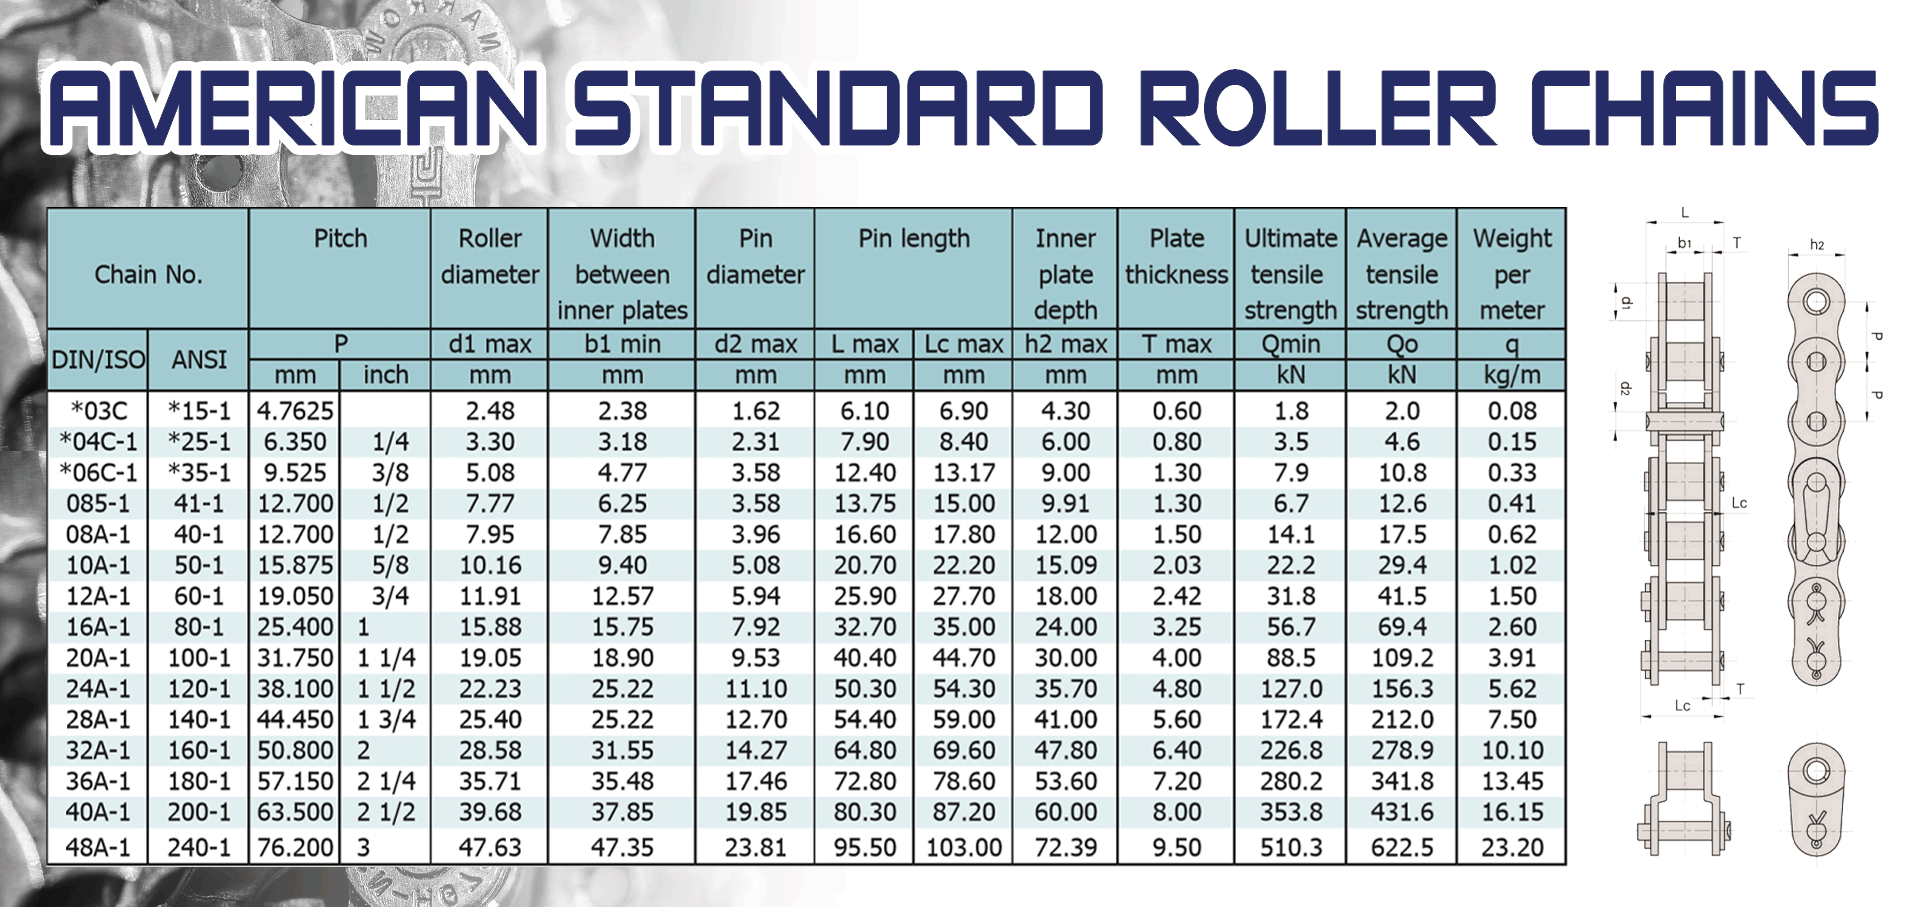 American Standard Roller Chains โซ่ขับมาตรฐานอเมริกา